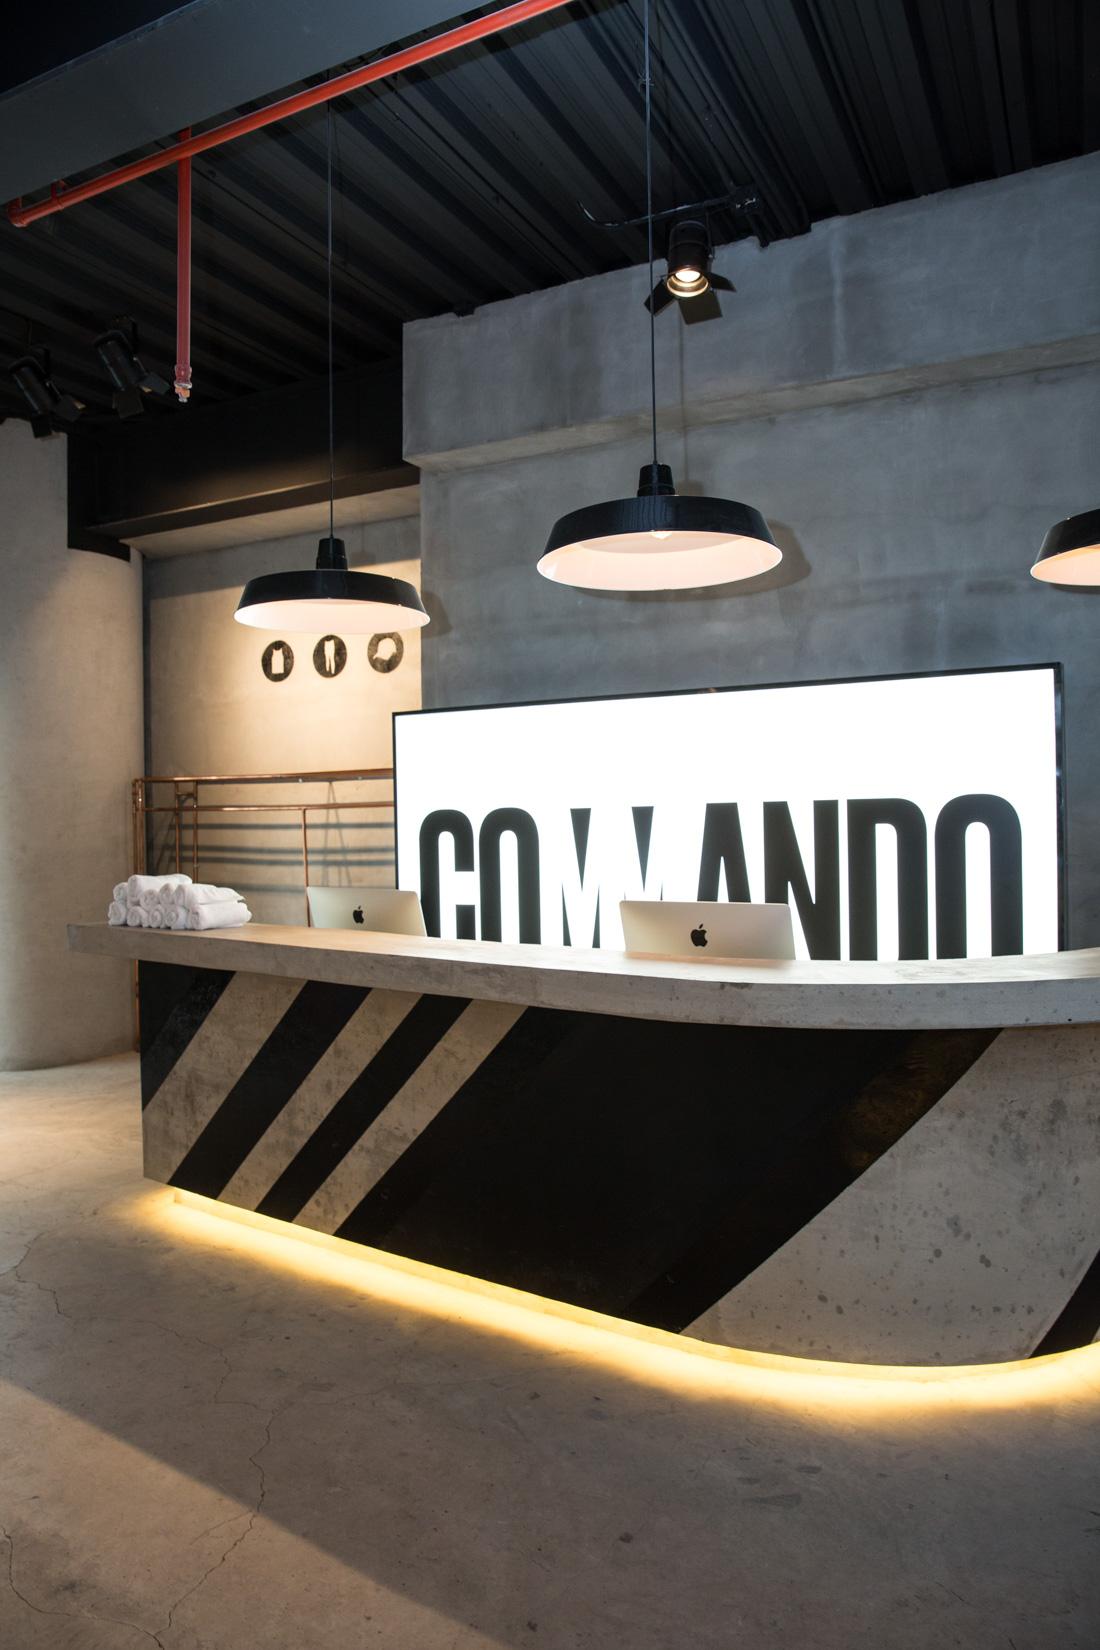 commando-9303.jpg